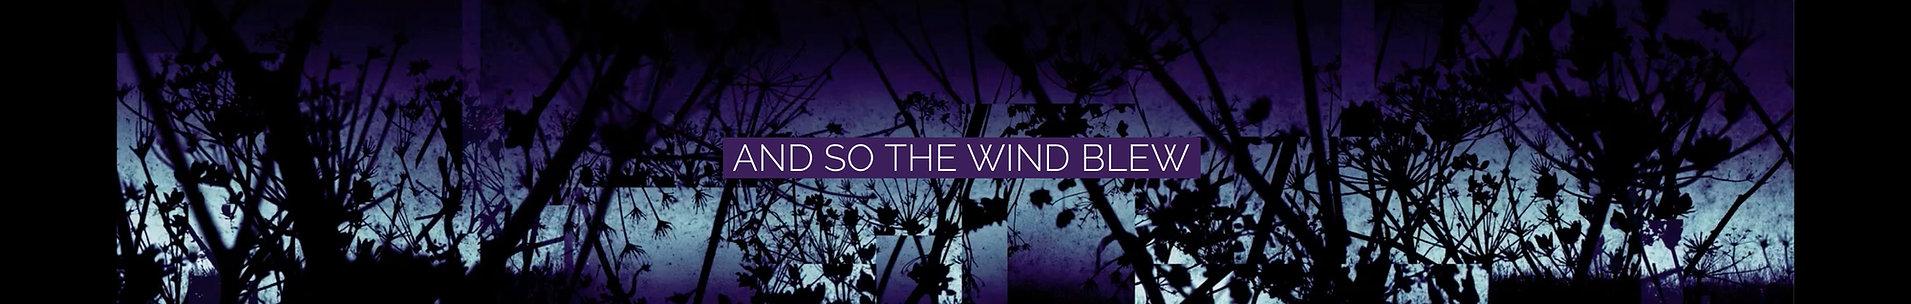 BANNERS_Wind.3.jpg